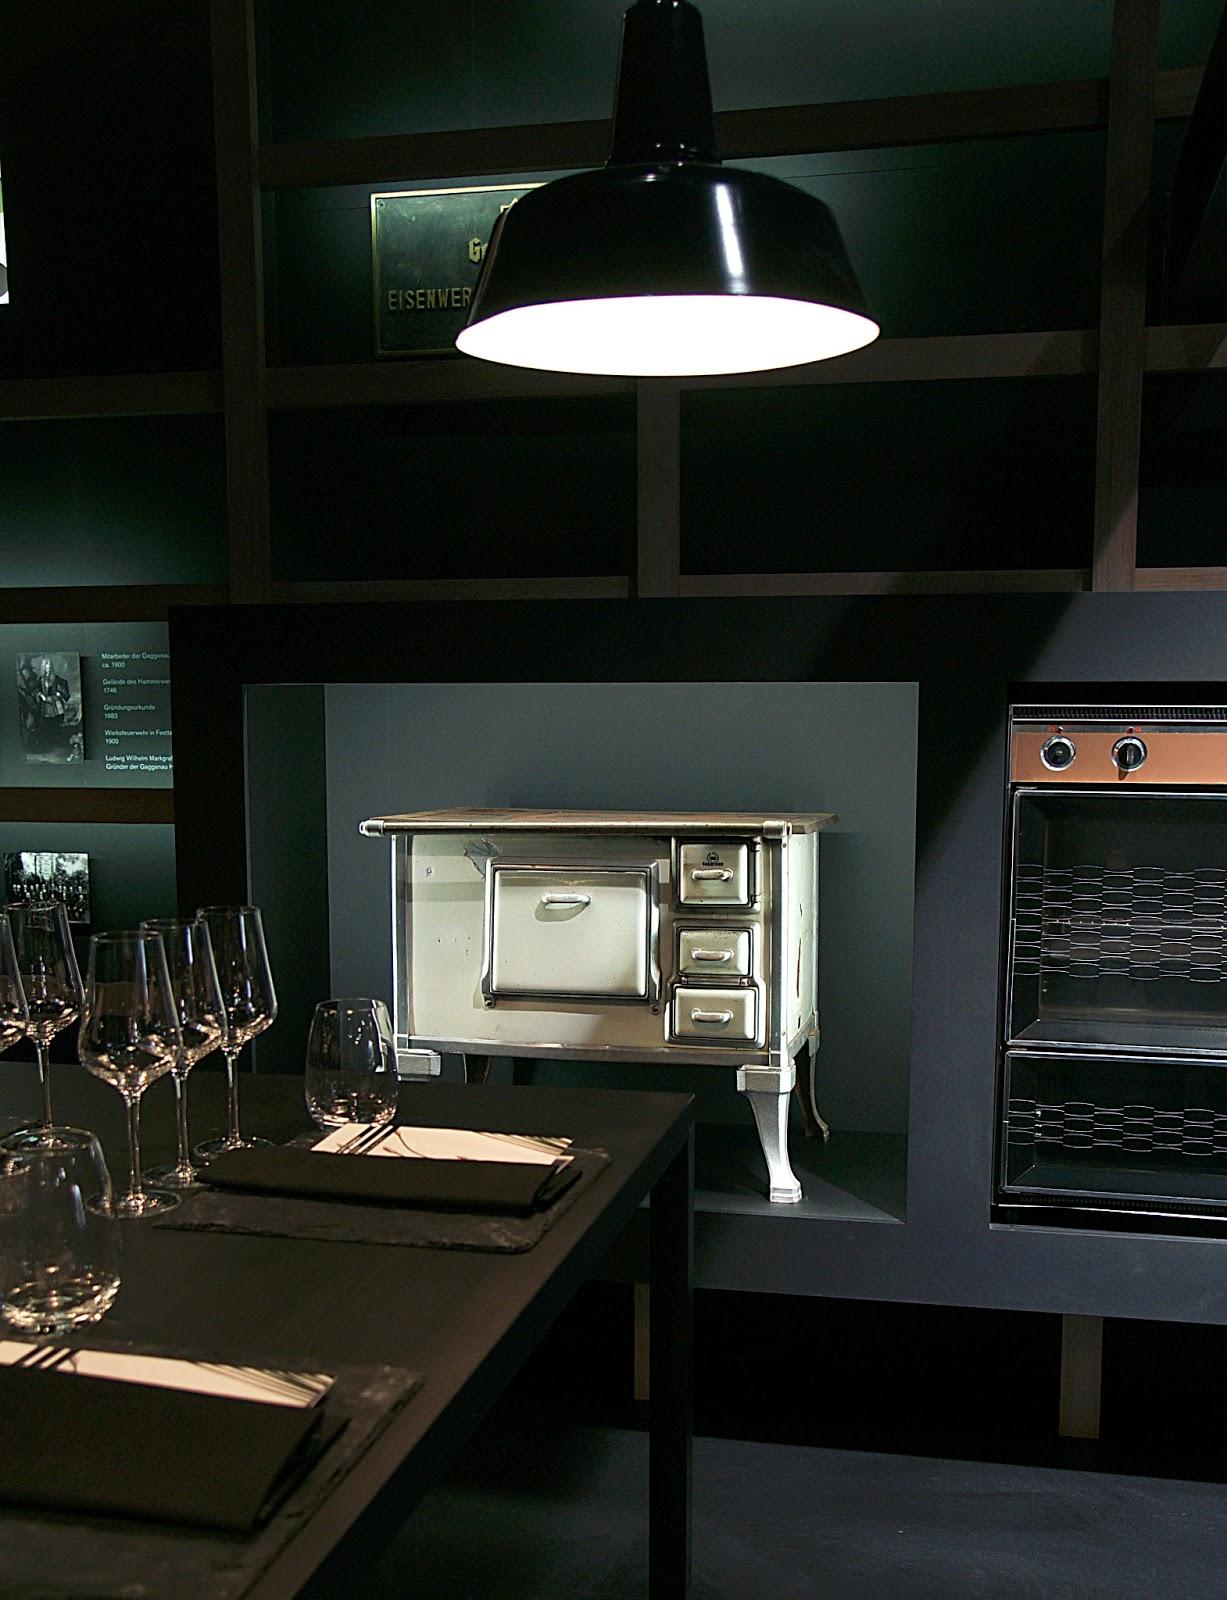 mea culina k chenwelt reine m nnersache. Black Bedroom Furniture Sets. Home Design Ideas